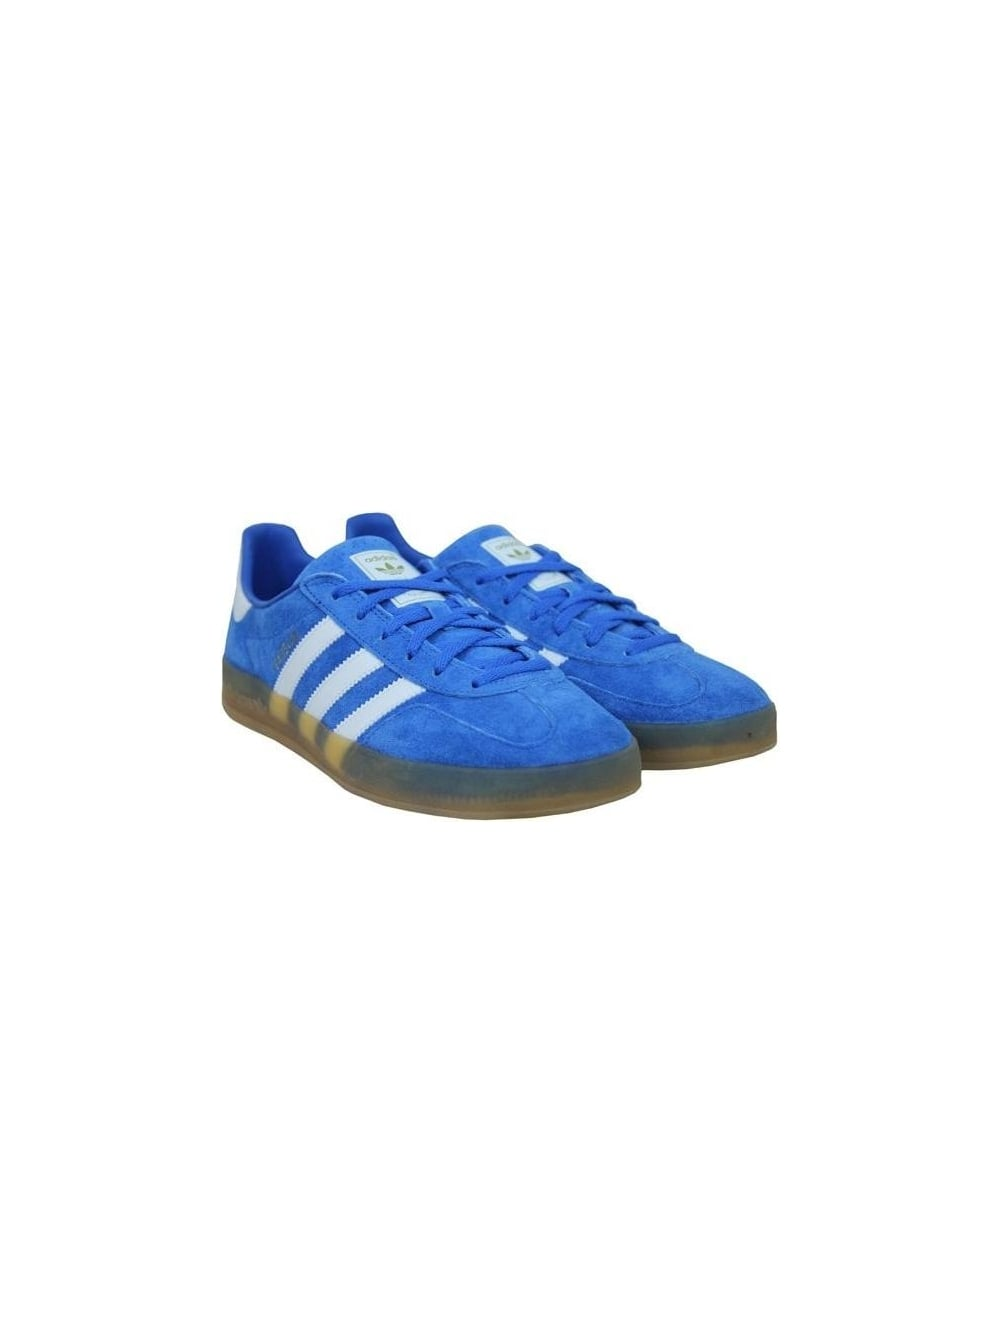 3e26776e1fb Adidas Gazelle Indoor in Bluebird - Northern Threads